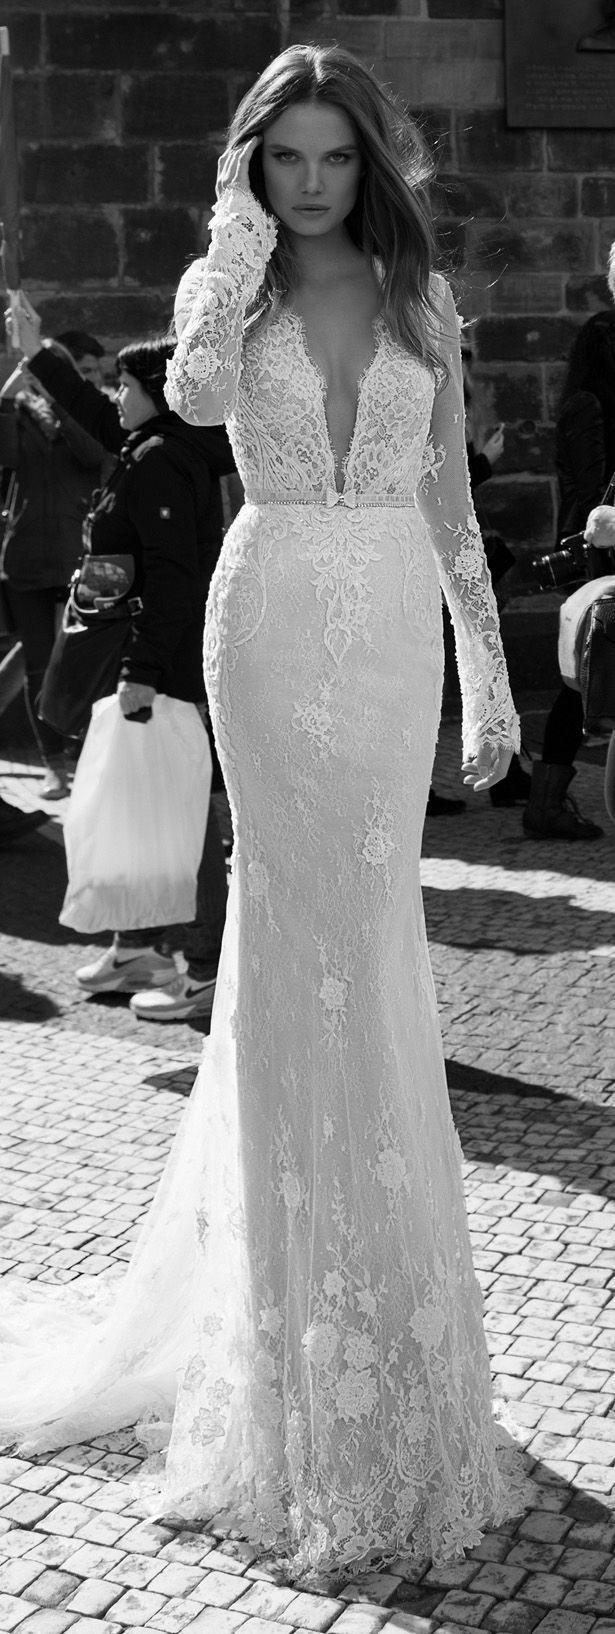 30 Chic Long Sleeve Wedding Dresses | http://www.deerpearlflowers.com/long-sleeve-wedding-dresses/